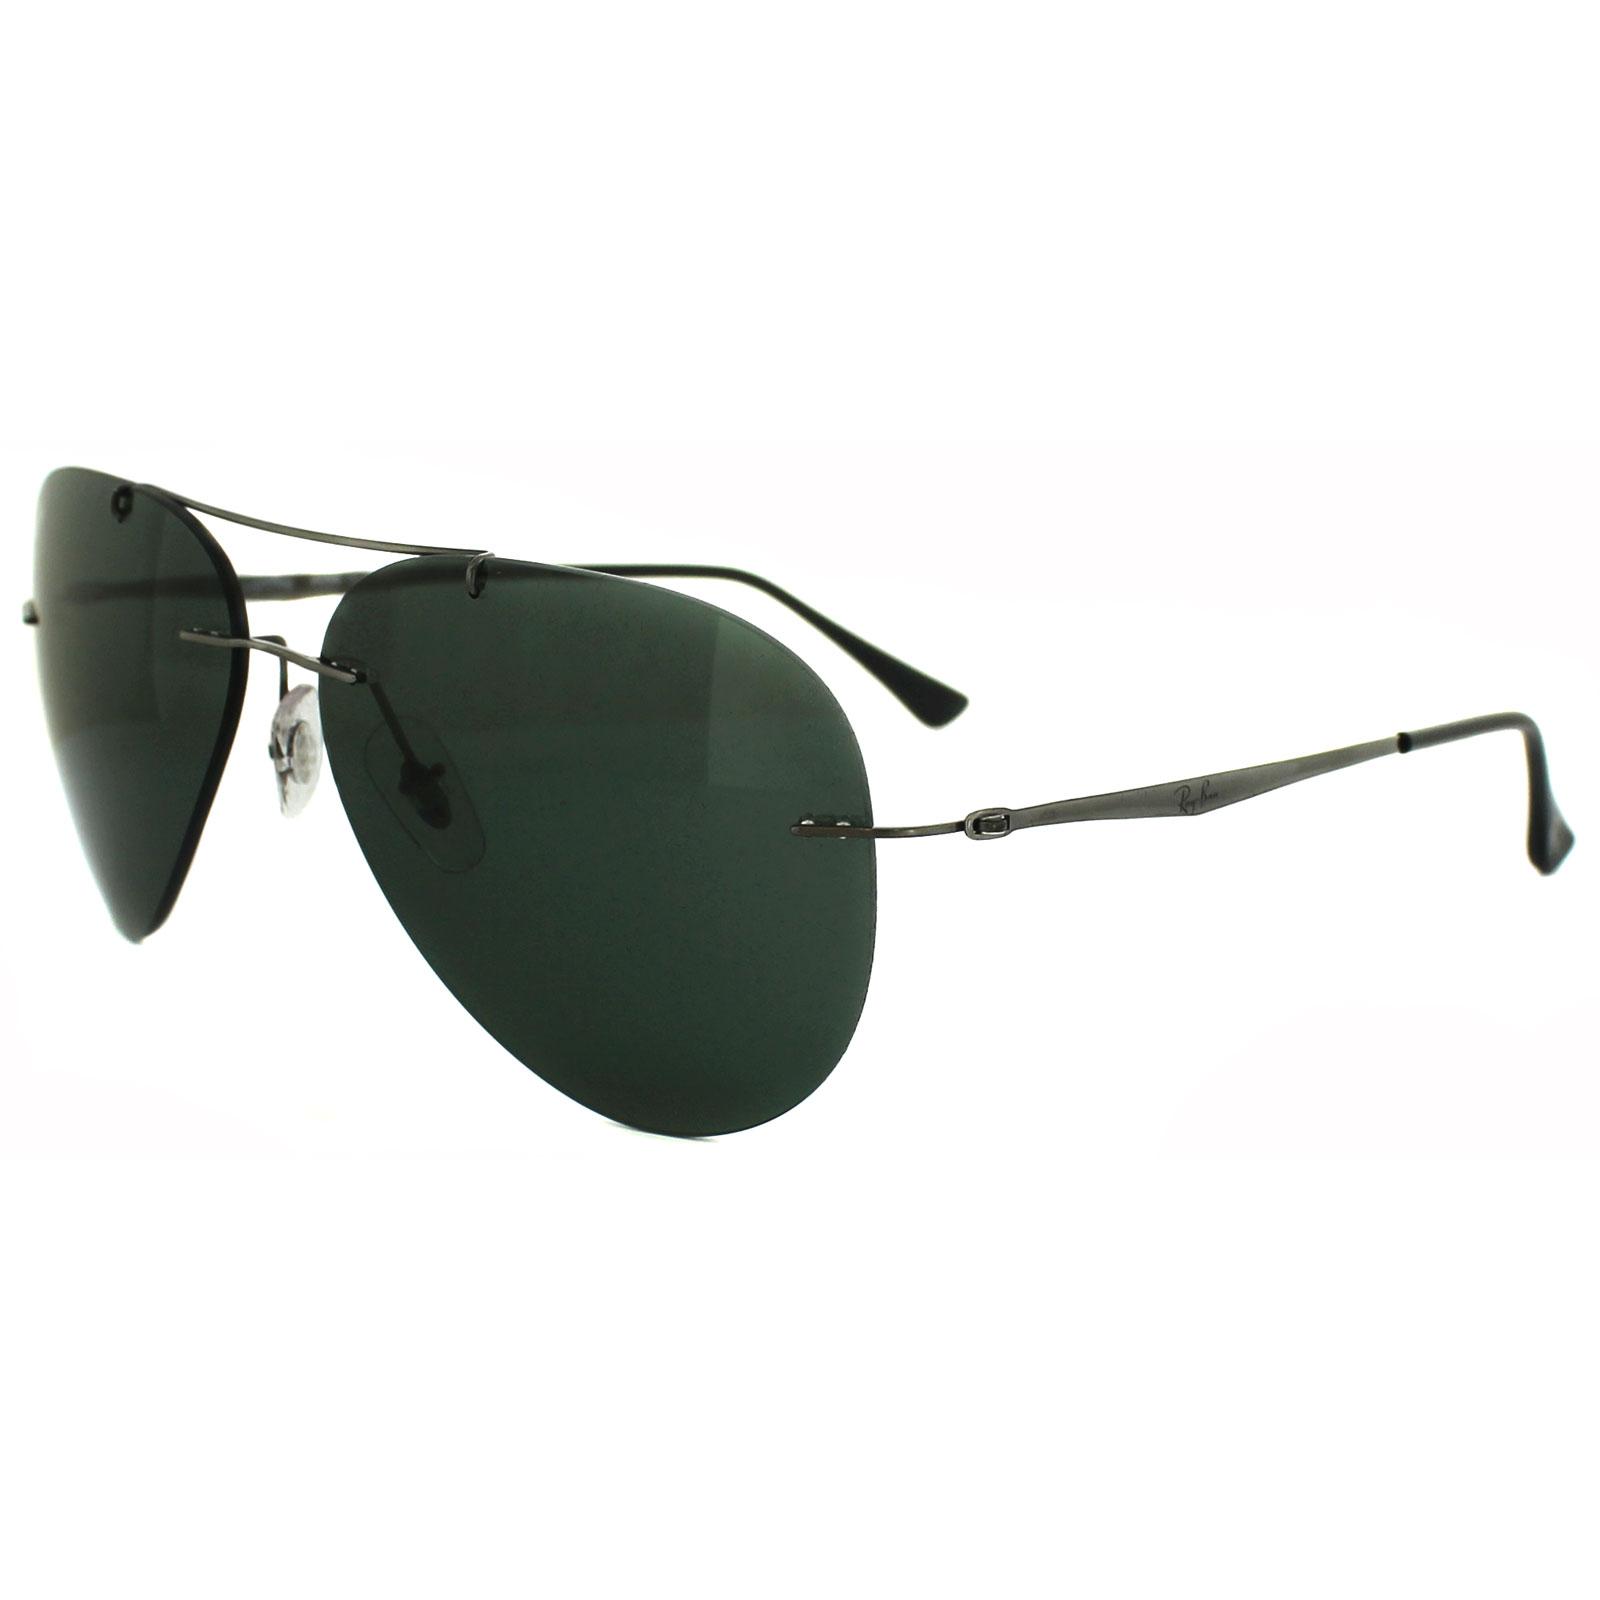 Ray Ban Sunglasses Aviator Light Ray 8055 004 71 Gunmetal